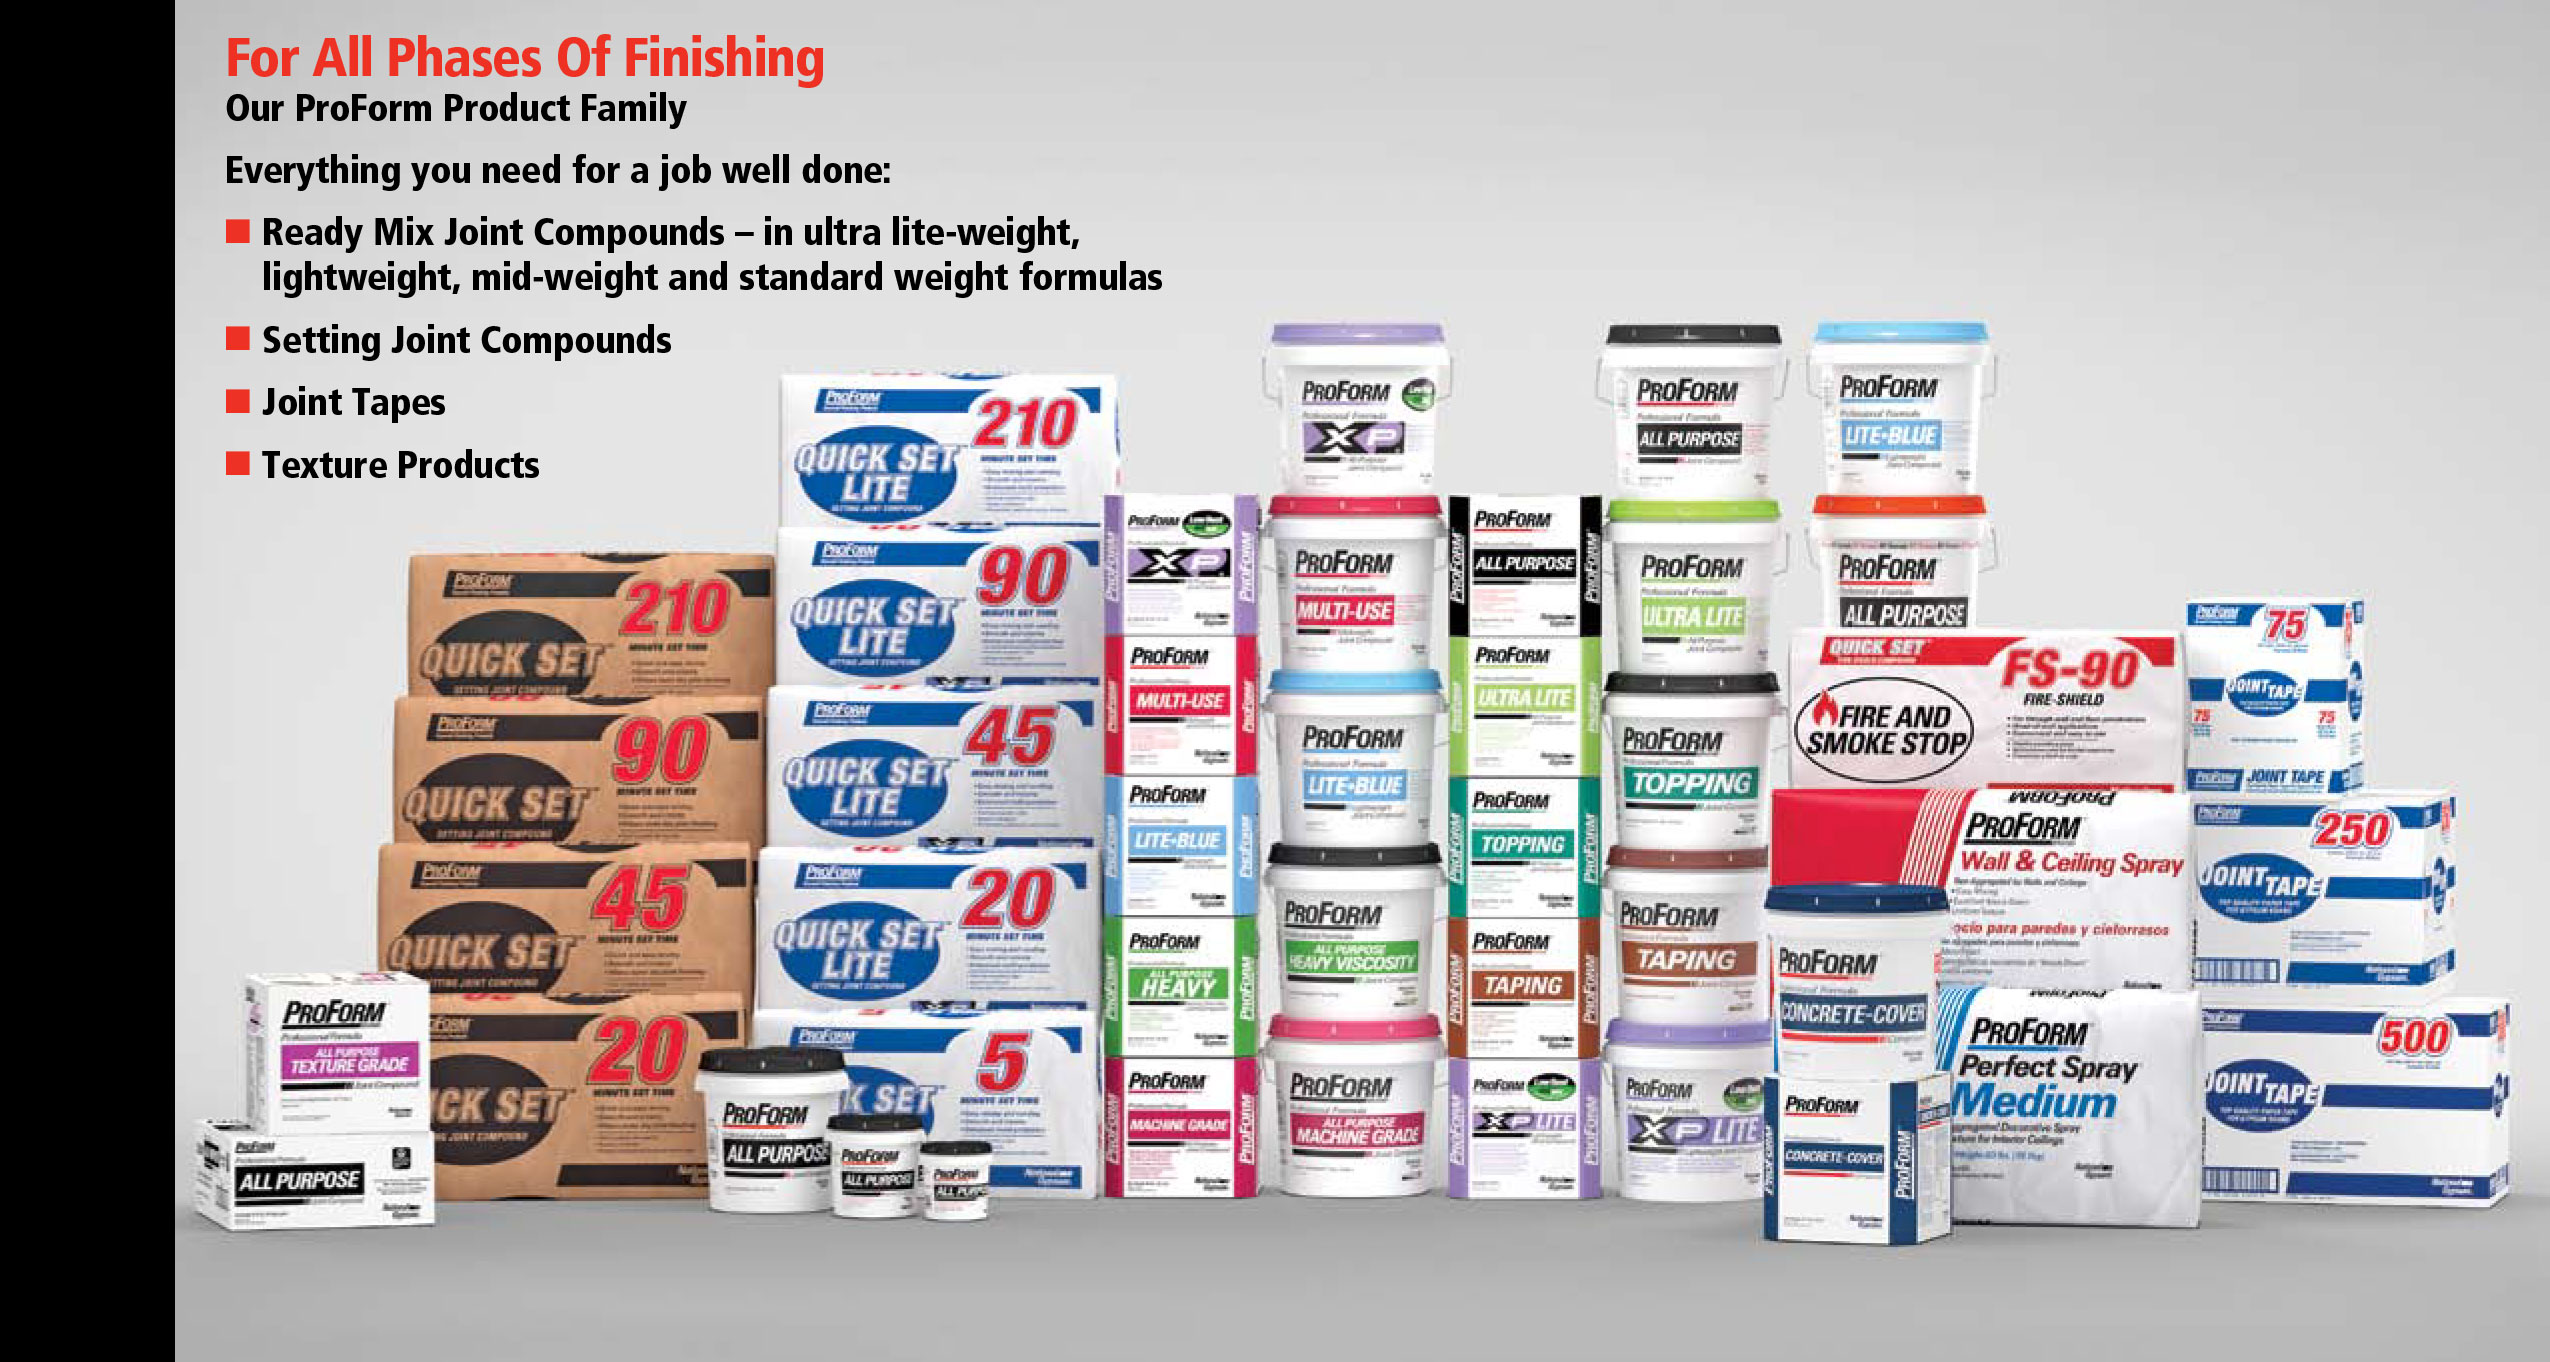 ProForm Interior Finishing Products